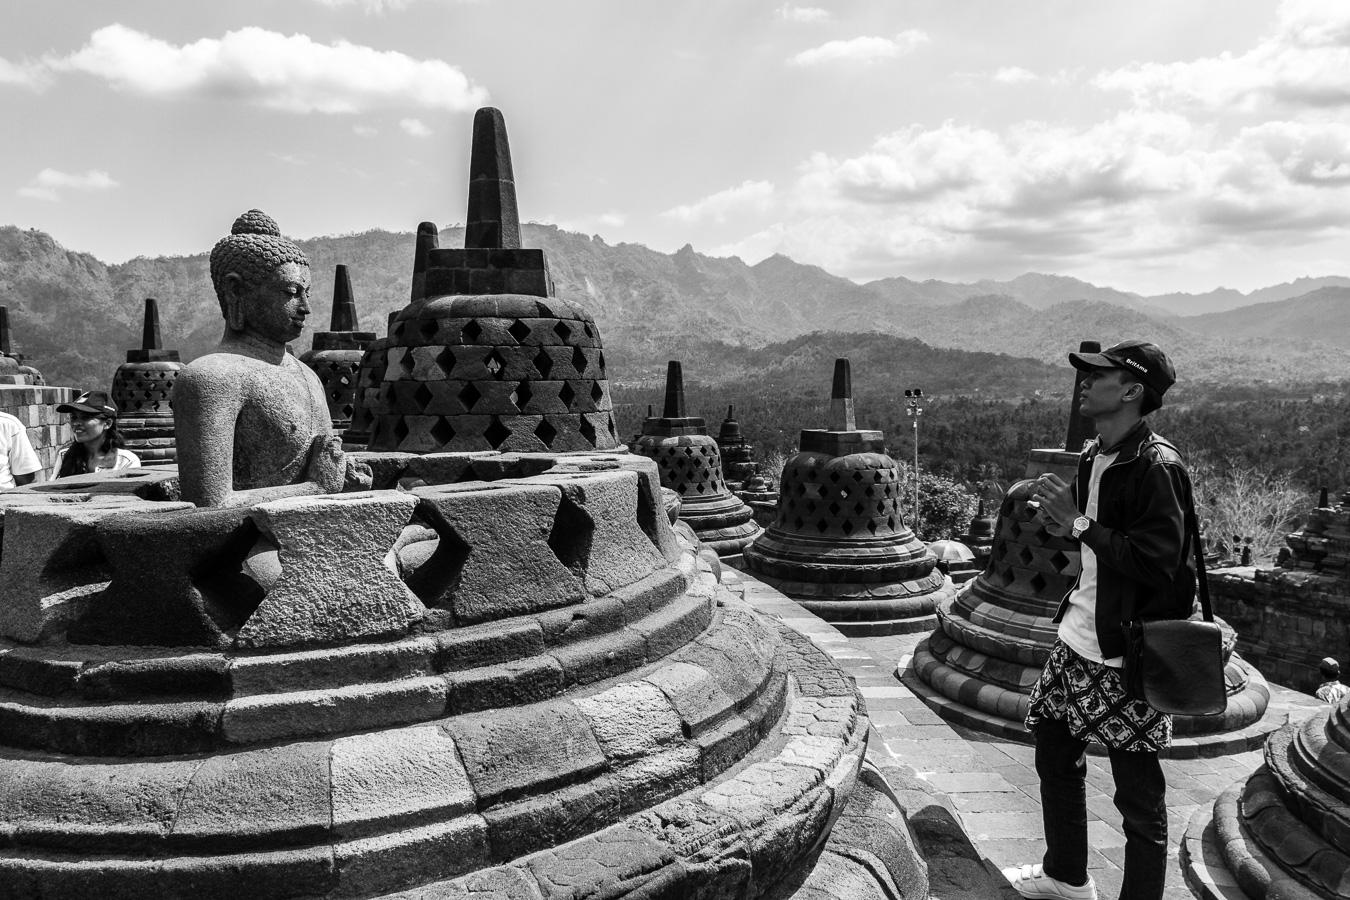 Photographie de voyage - Borobudur, Java, Indonésie